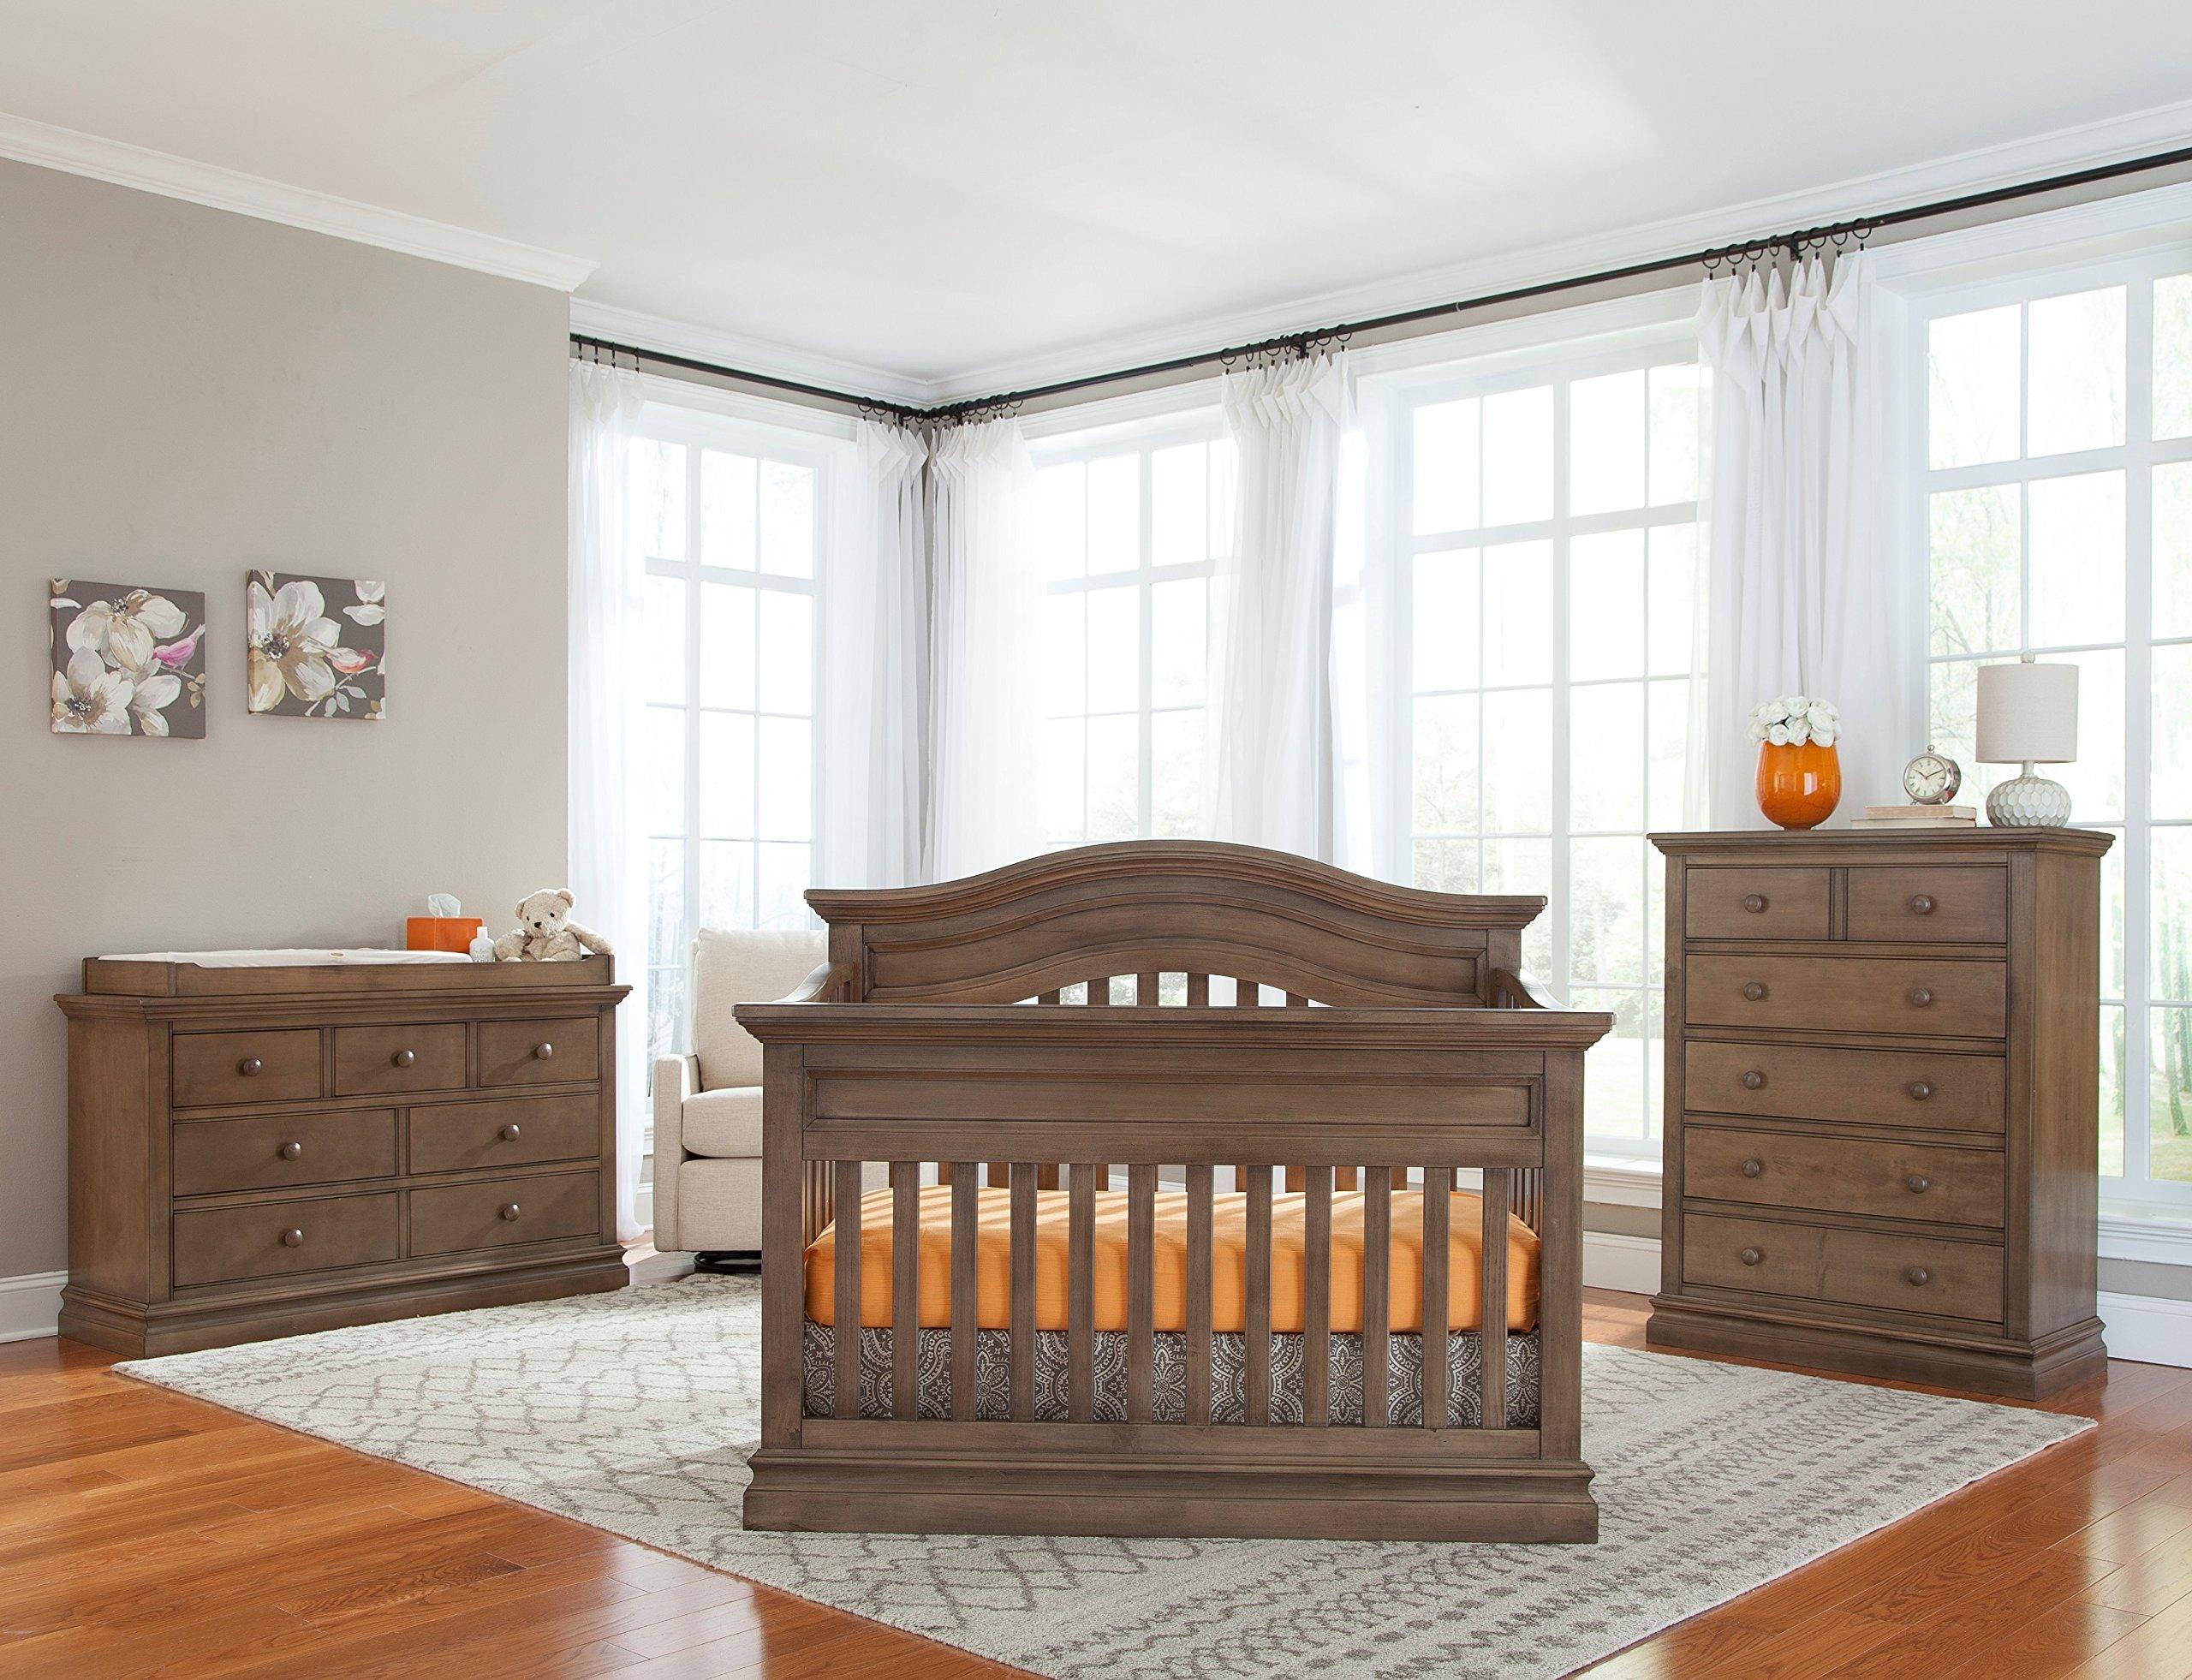 Westwood Design Pine Ridge/Stone Harbor 7 Drawer Double Dresser Chest, Cashew